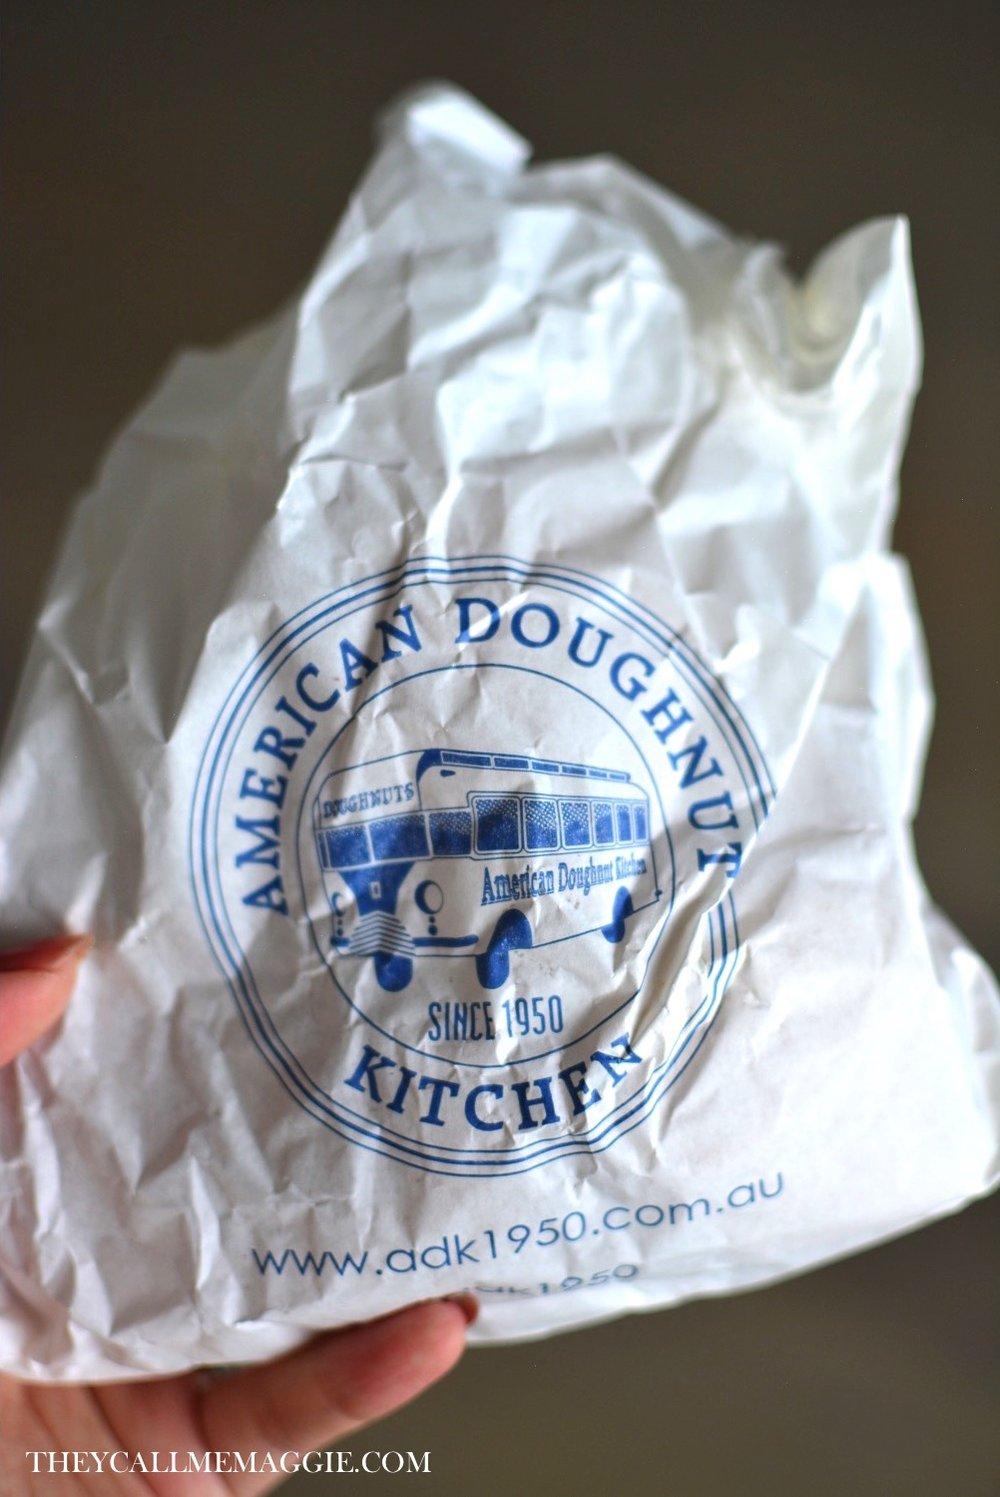 american-doughnuts-qvm.jpg